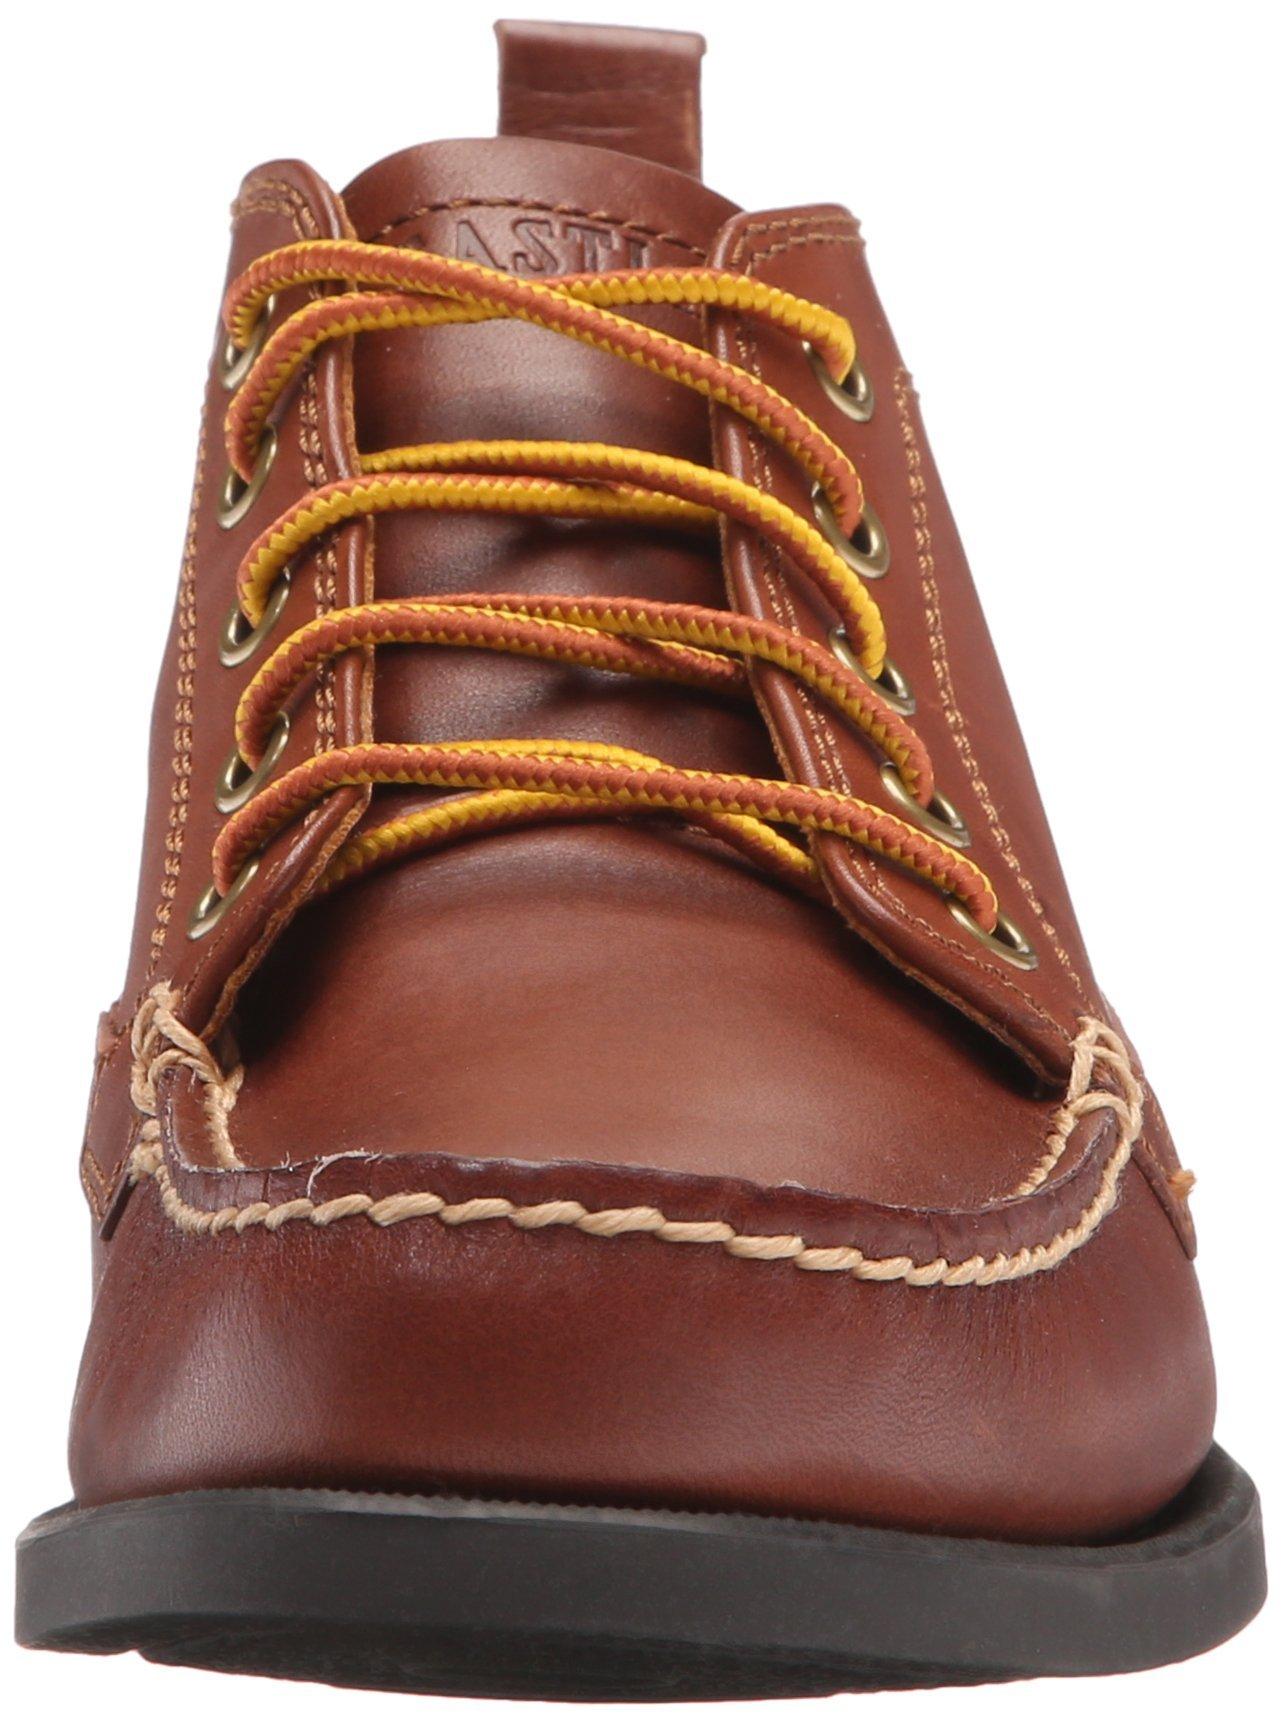 Eastland Men's Seneca Chukka Boot, Tan, 14 W US by Eastland (Image #4)